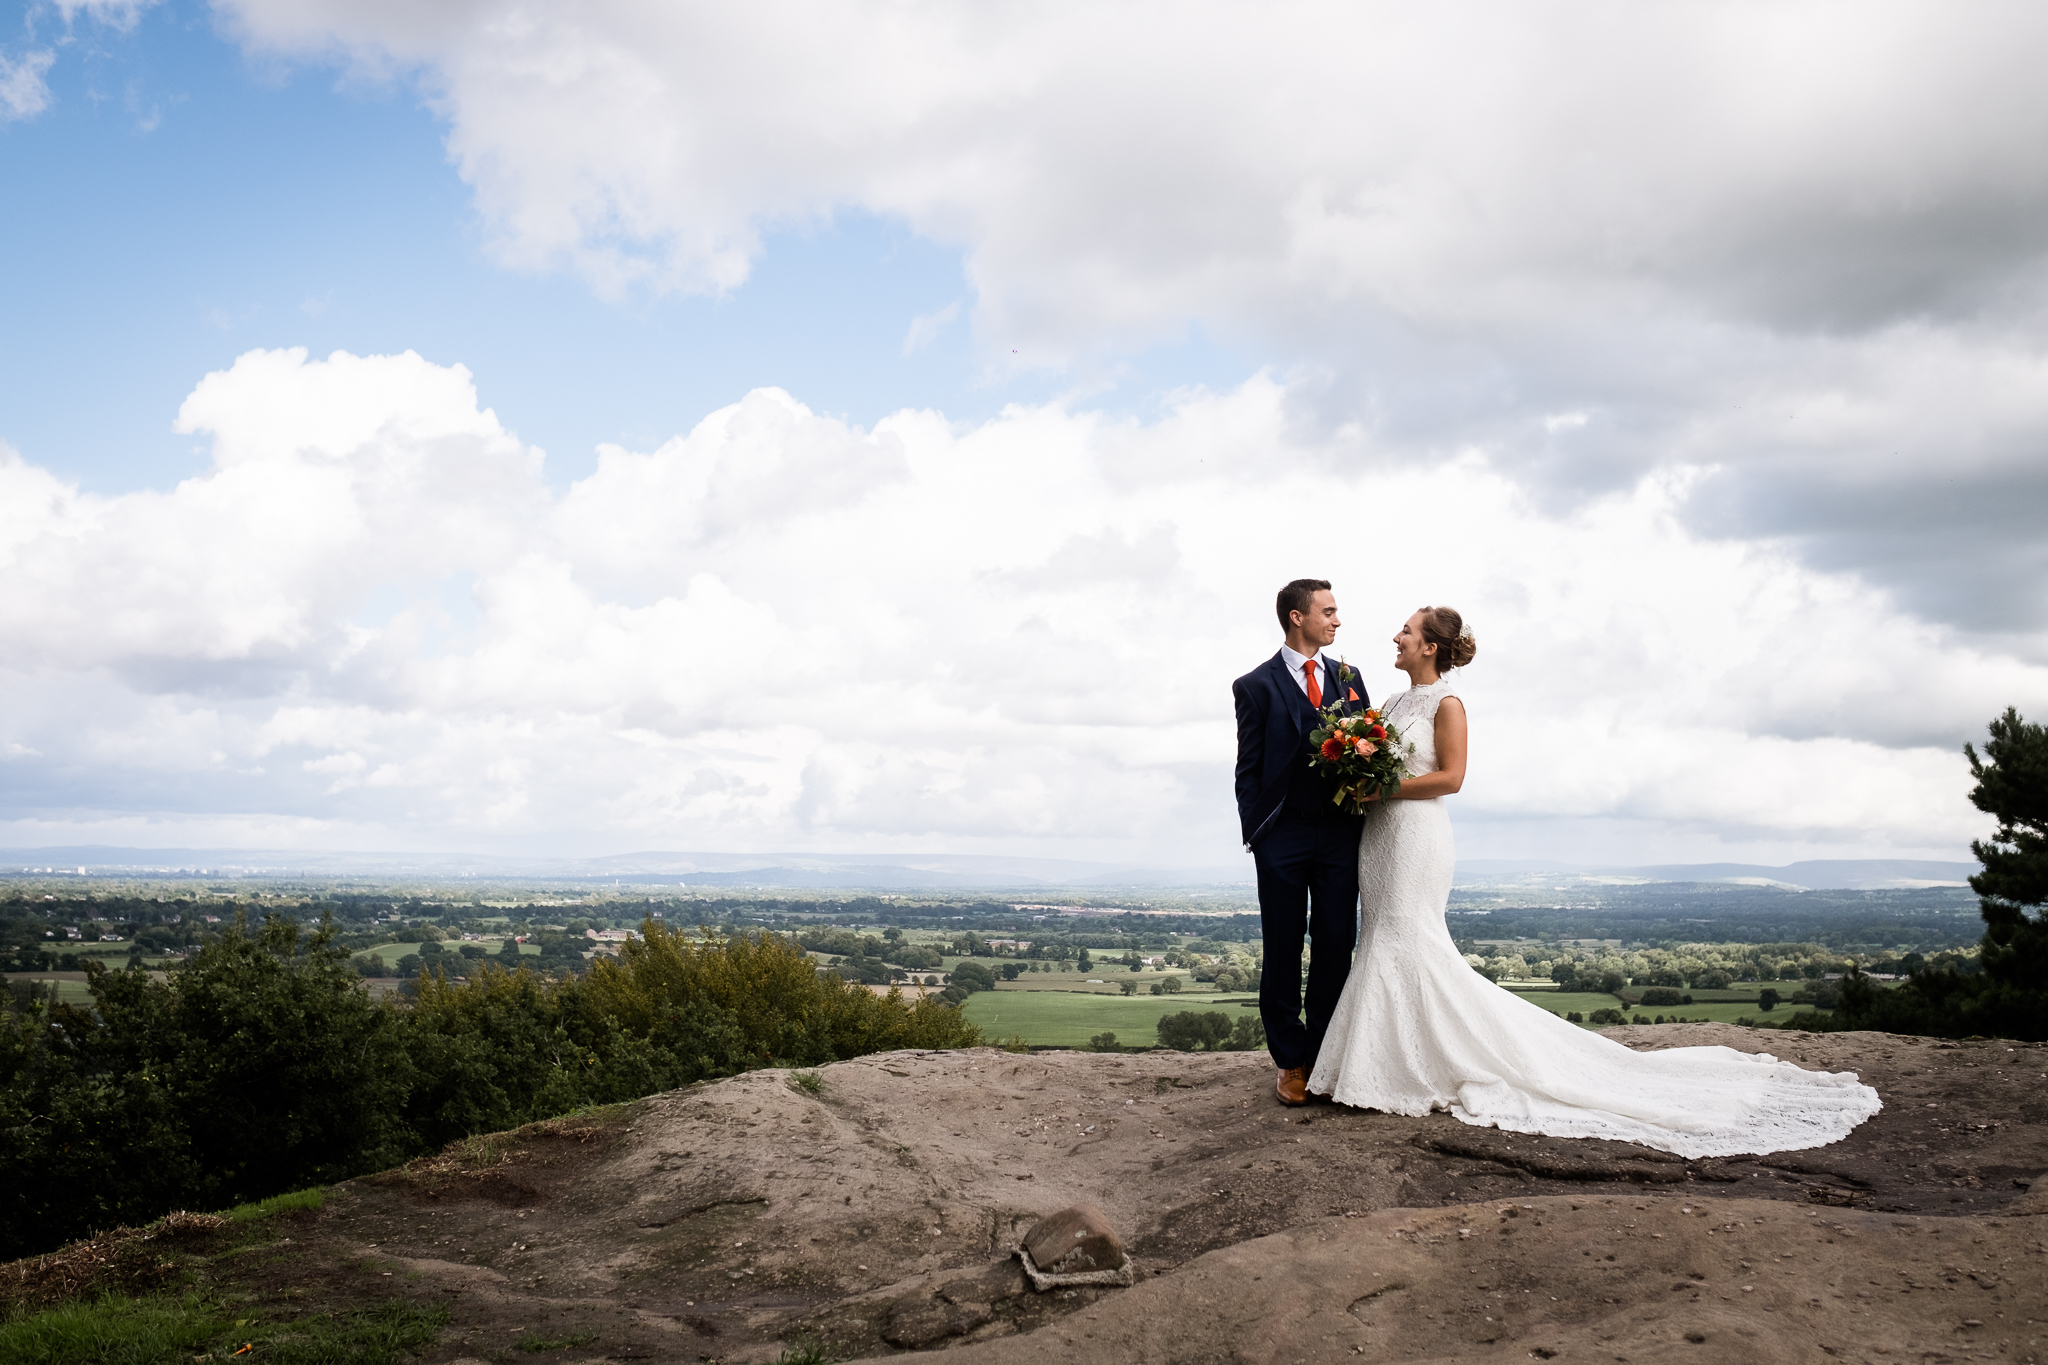 Relaxed Documentary Wedding Photography at The Wizard Inn, Alderley Edge Cheshire - Jenny Harper-45.jpg